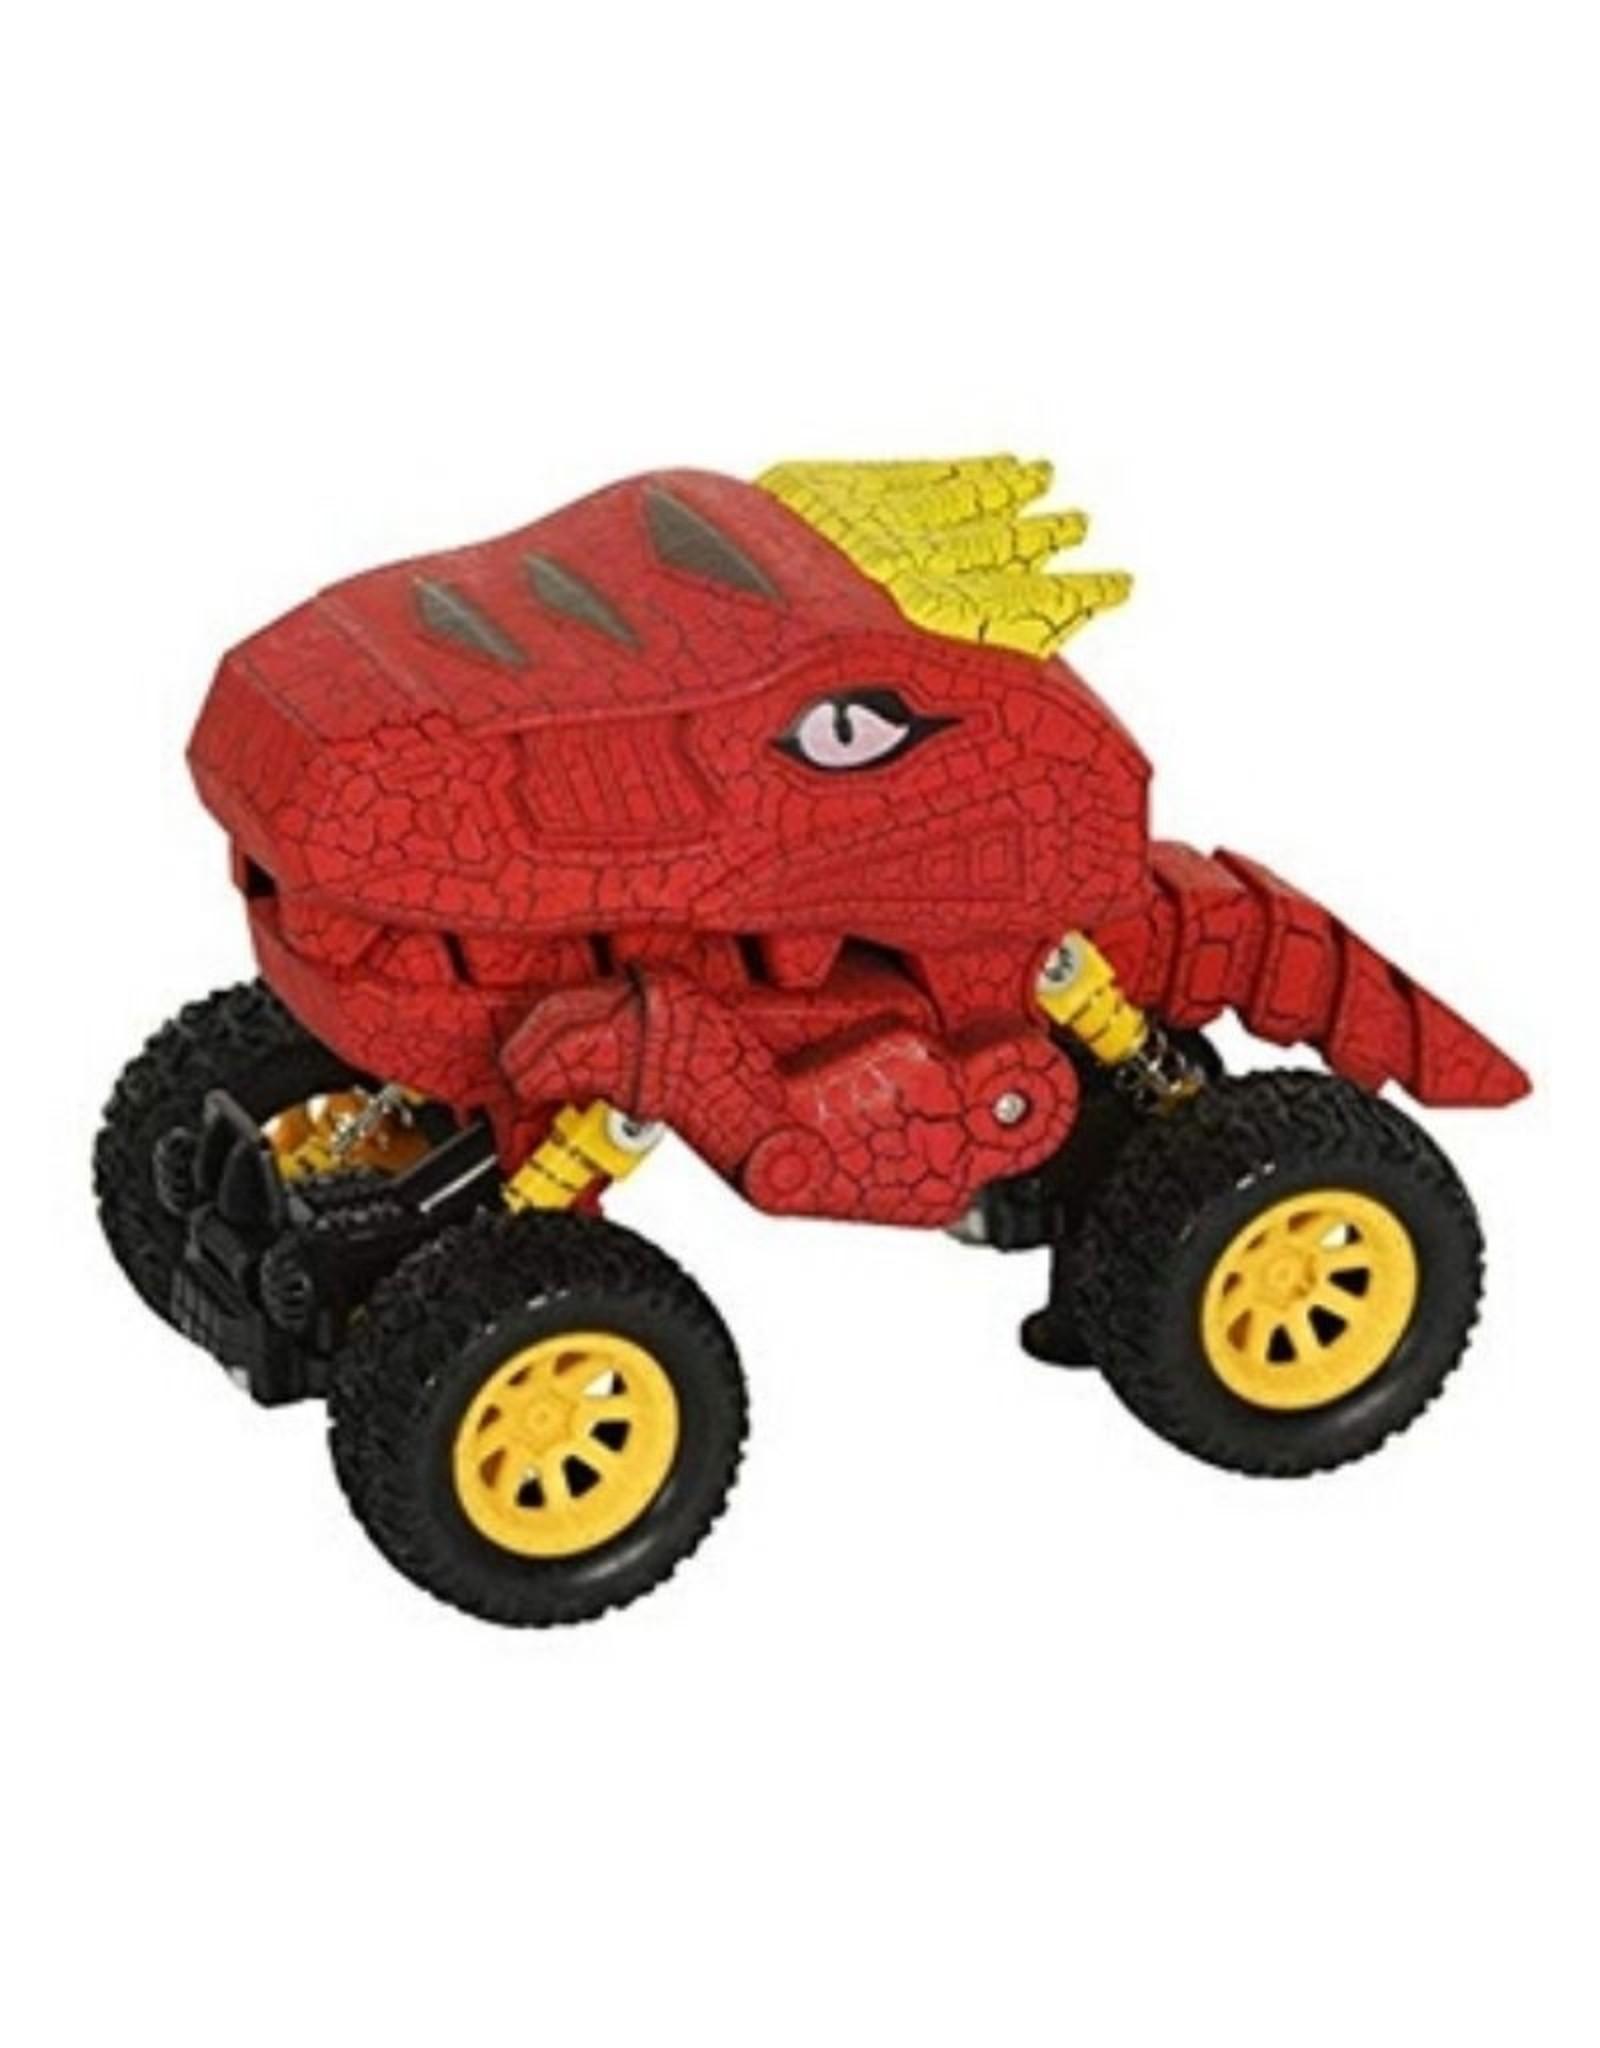 Aeromax Dino-Faurs Dinosaur Truck Red/Yellow